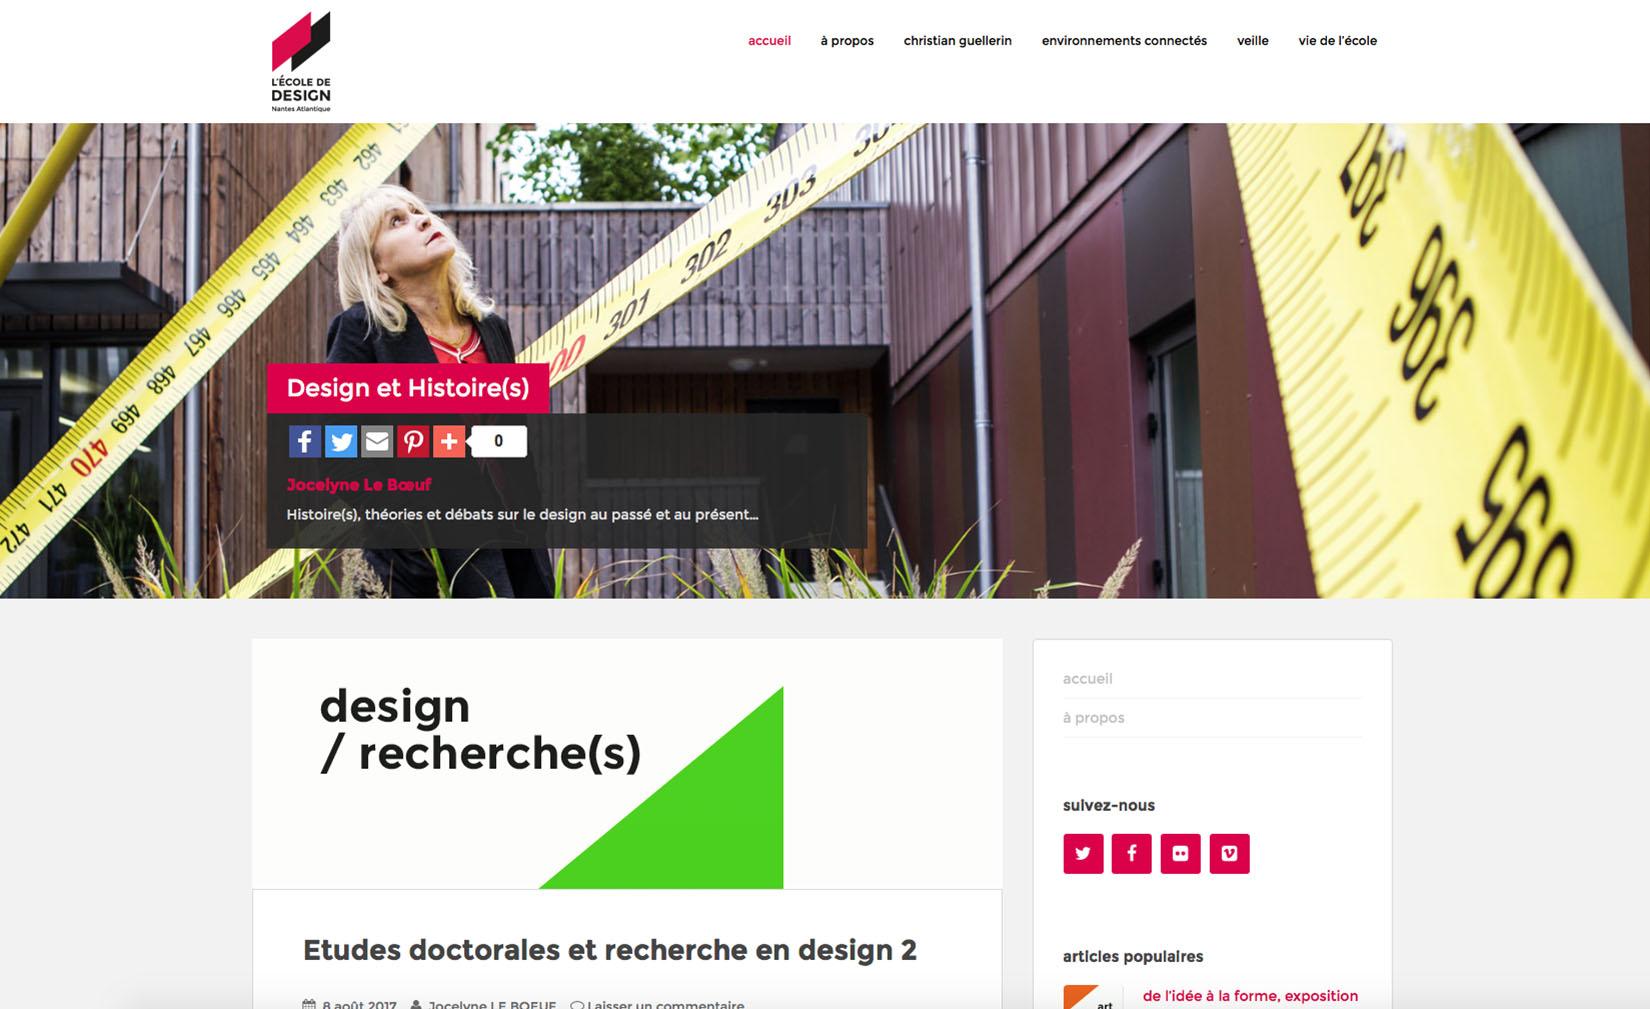 blog-jocelyne-leboeuf